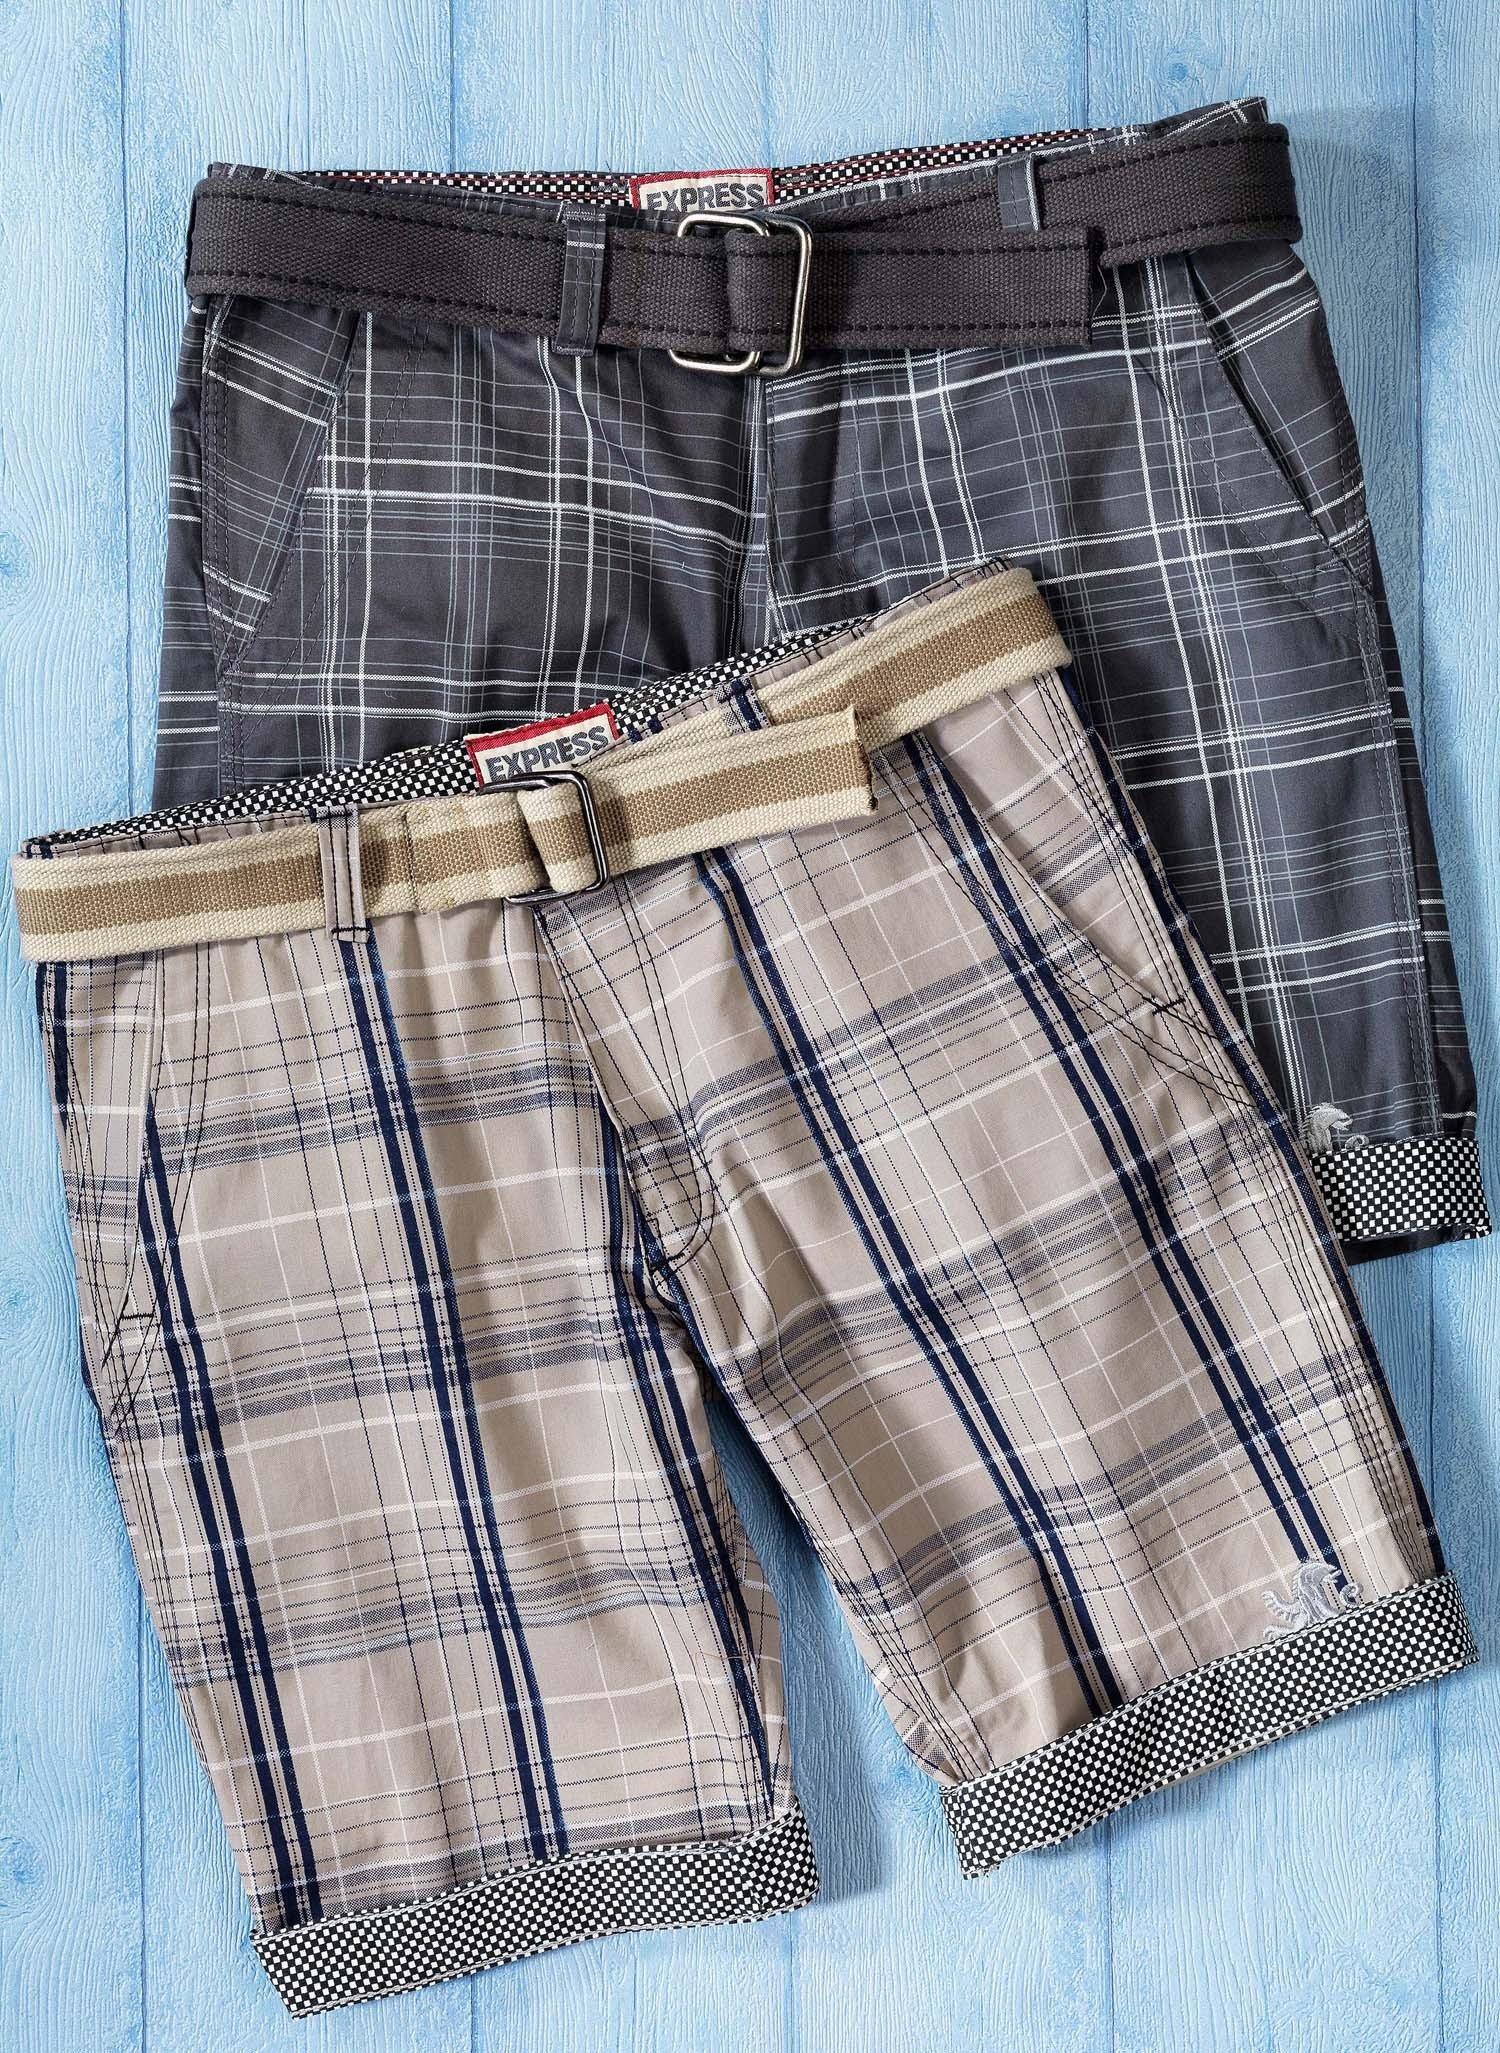 H-Bermuda-Shorts,Karo anthraz. 38 013 - 2 - Ronja.ch